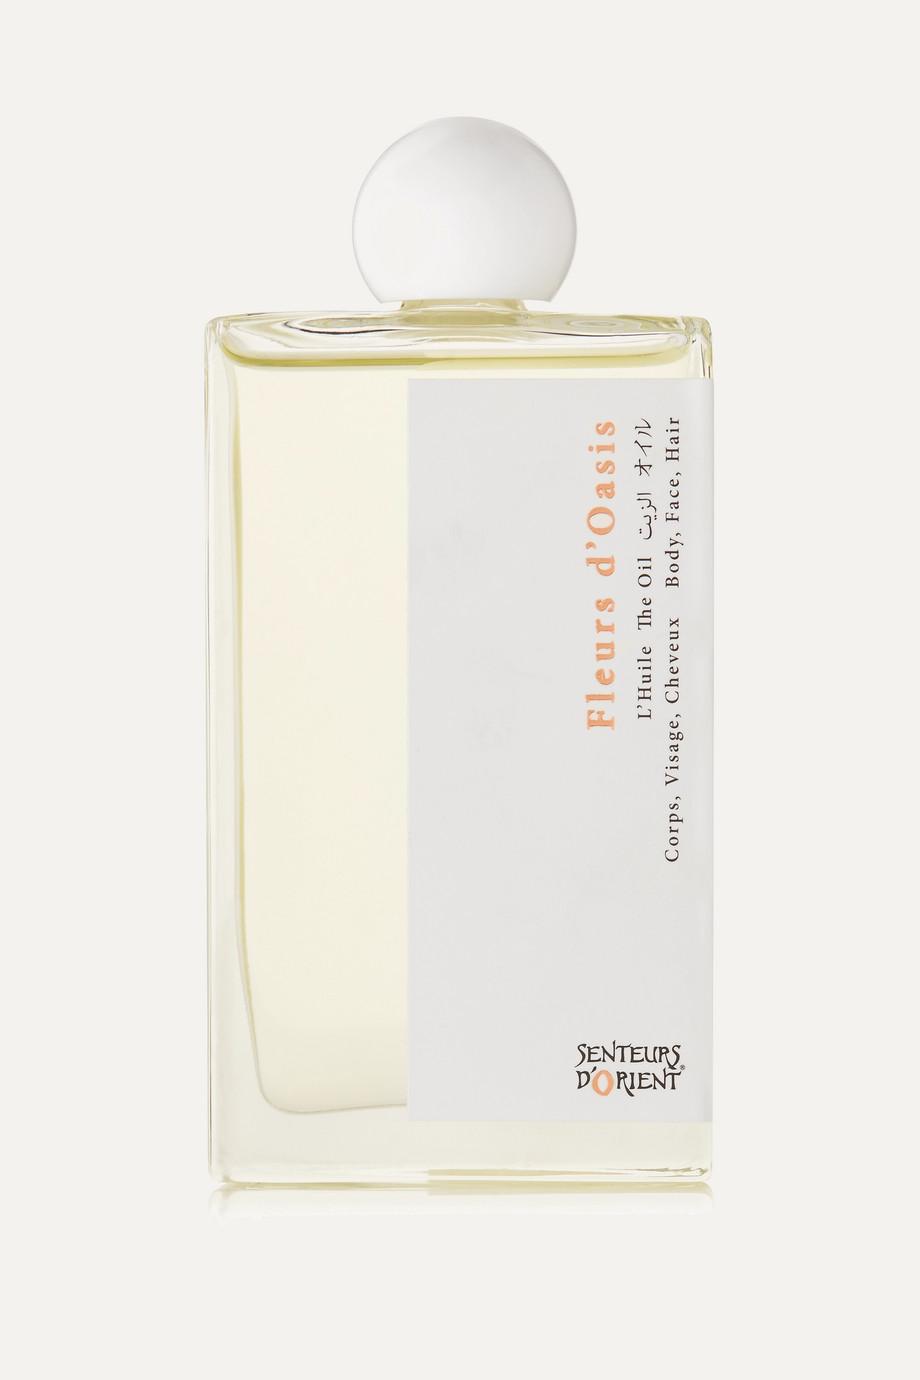 Senteurs d'Orient + NET SUSTAIN Fleurs d'Oasis Body Oil, 75ml